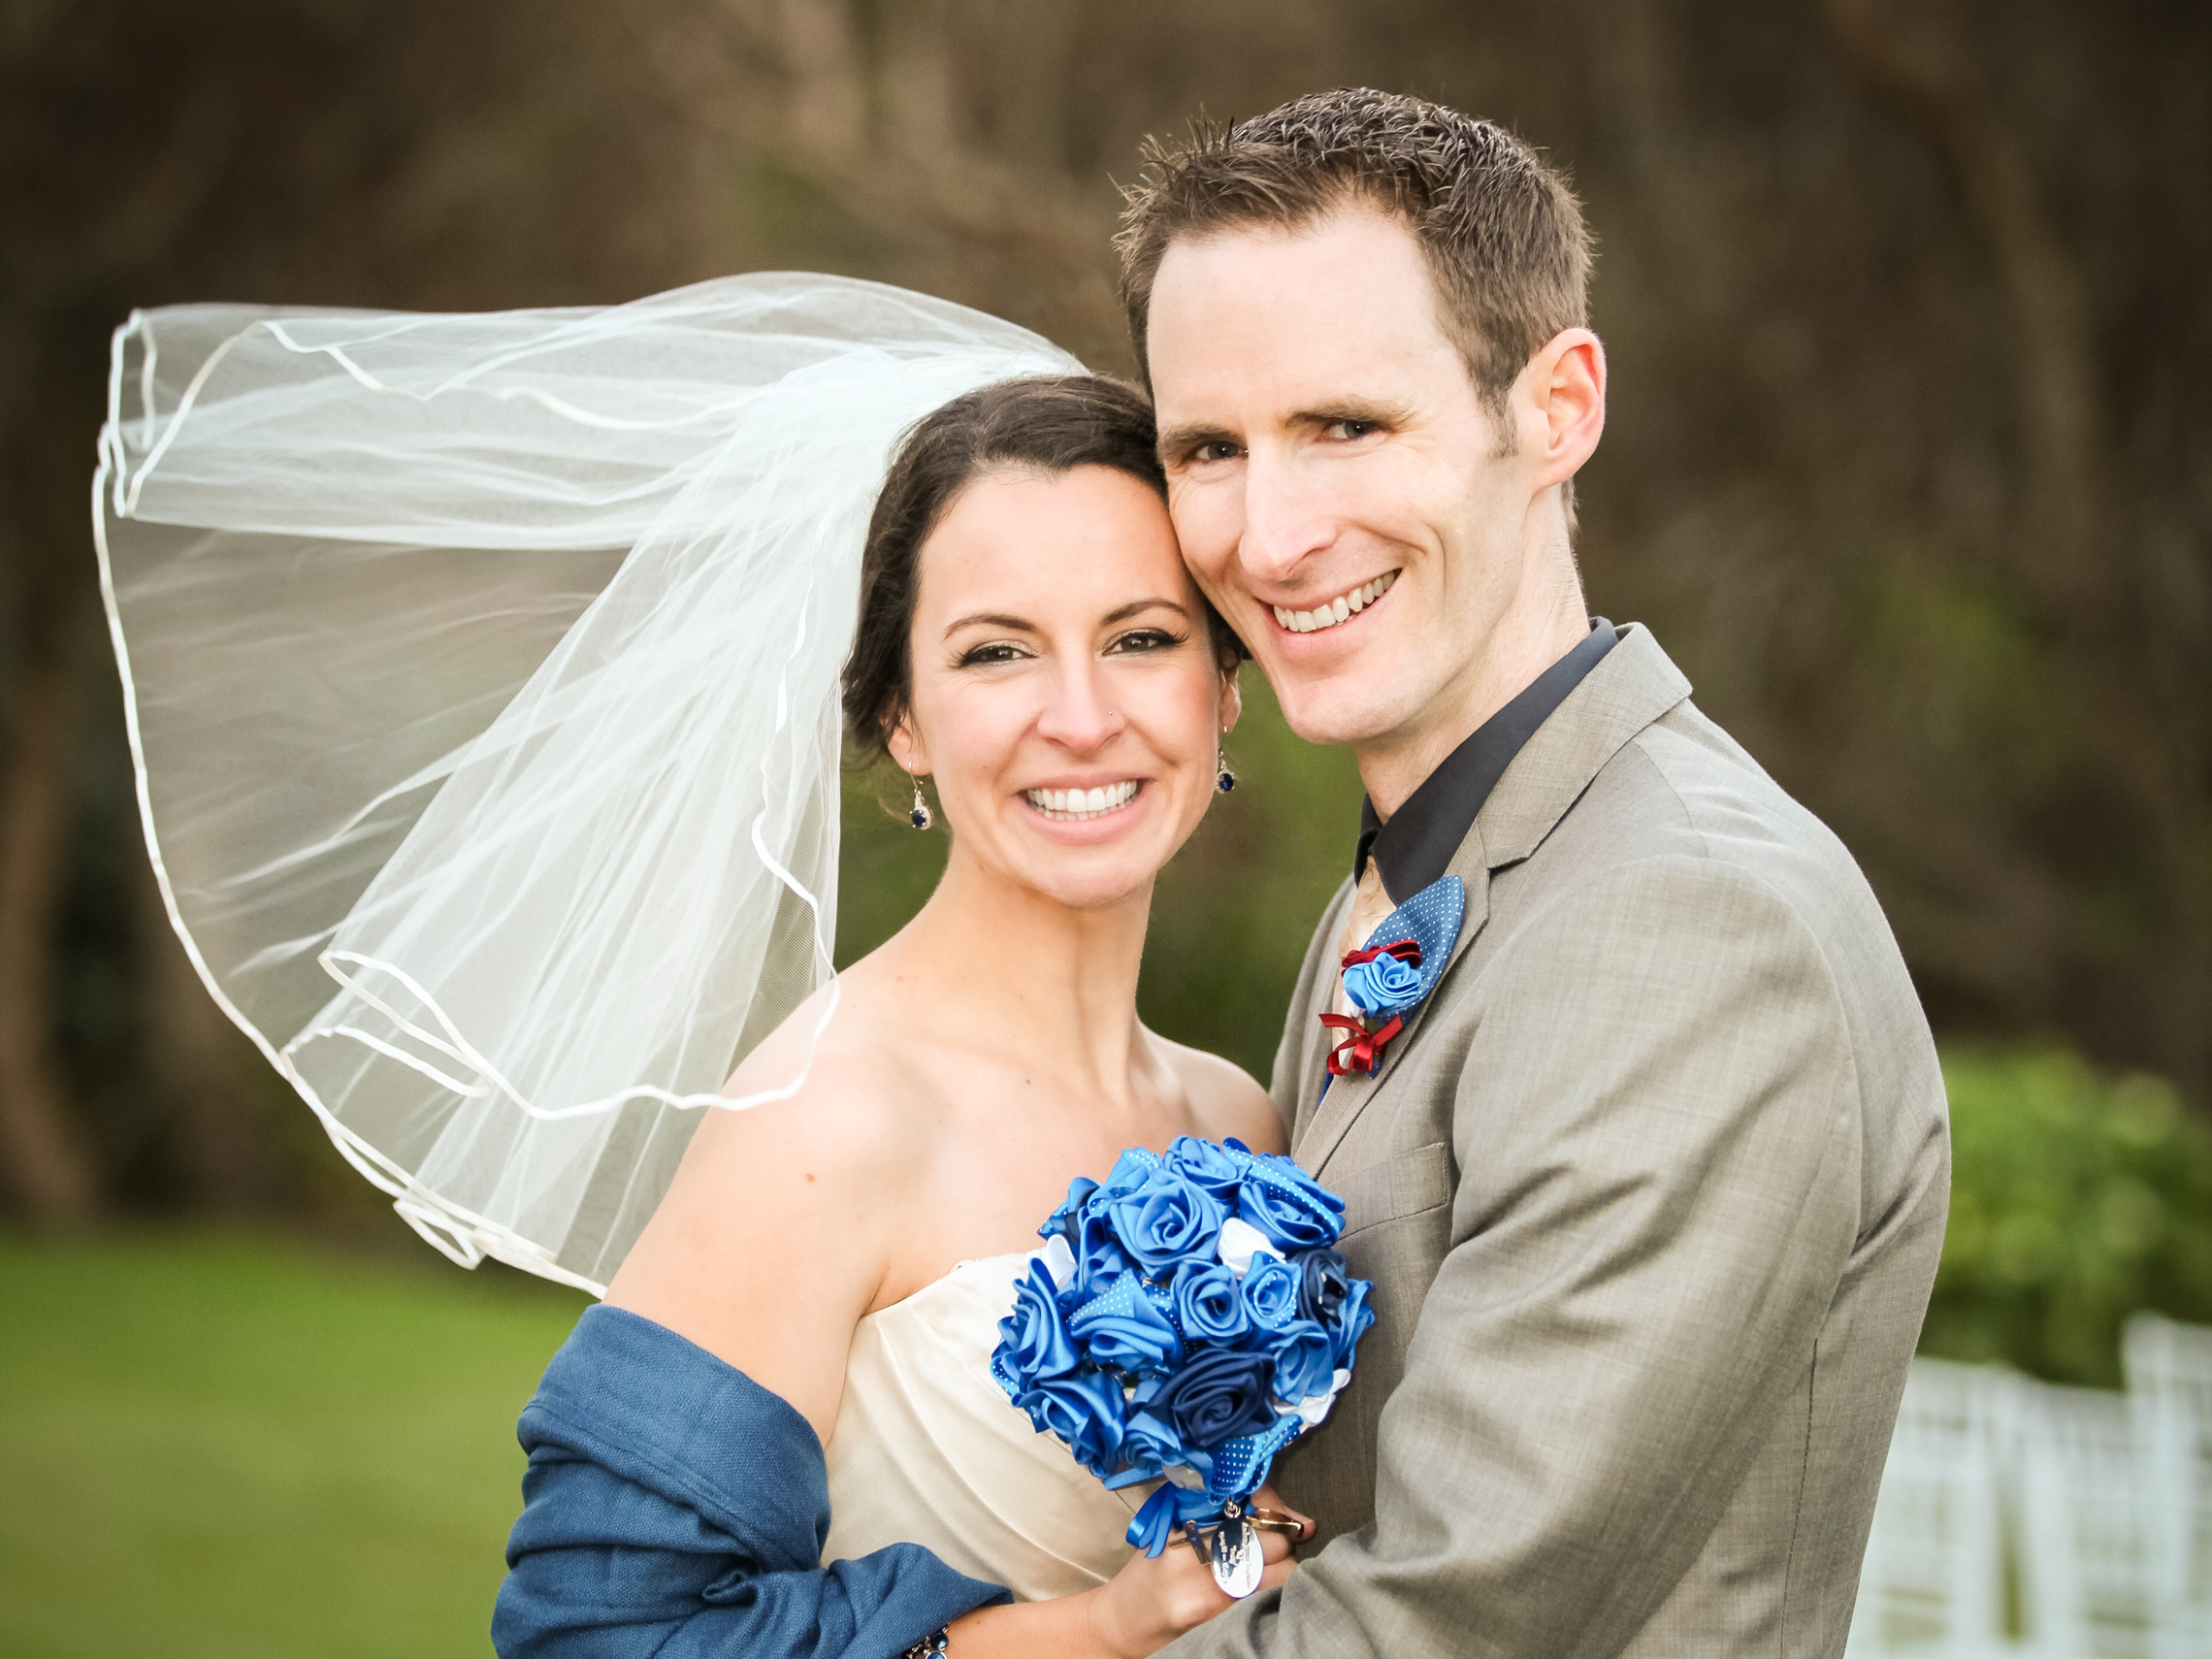 Wedding photographer Auckland testimonial-3